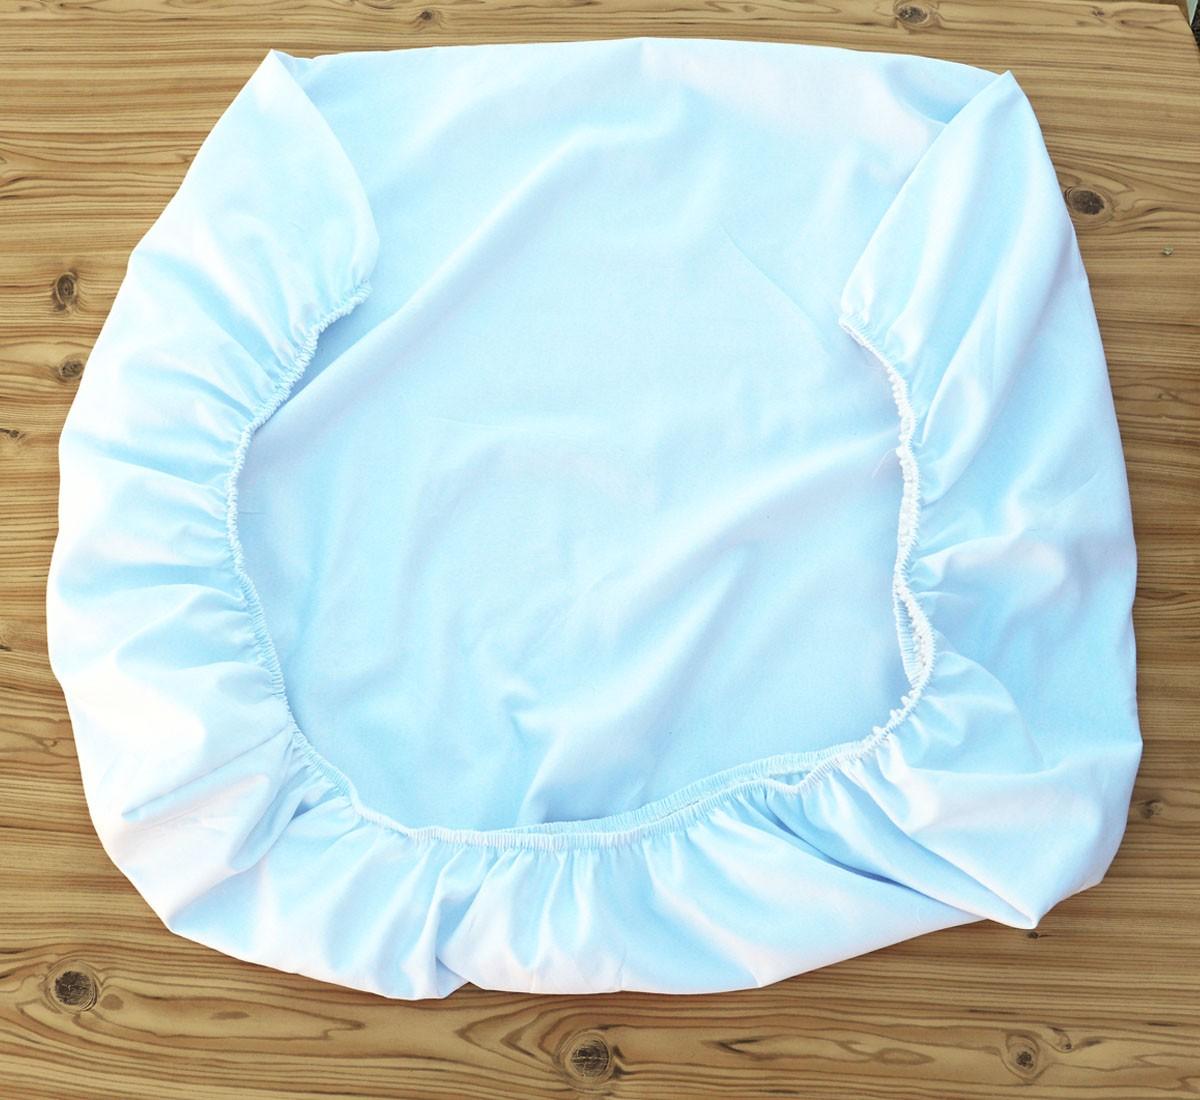 Enxoval Bebê Manta + Lençol de Berço Padrão -Kit 3 Peças